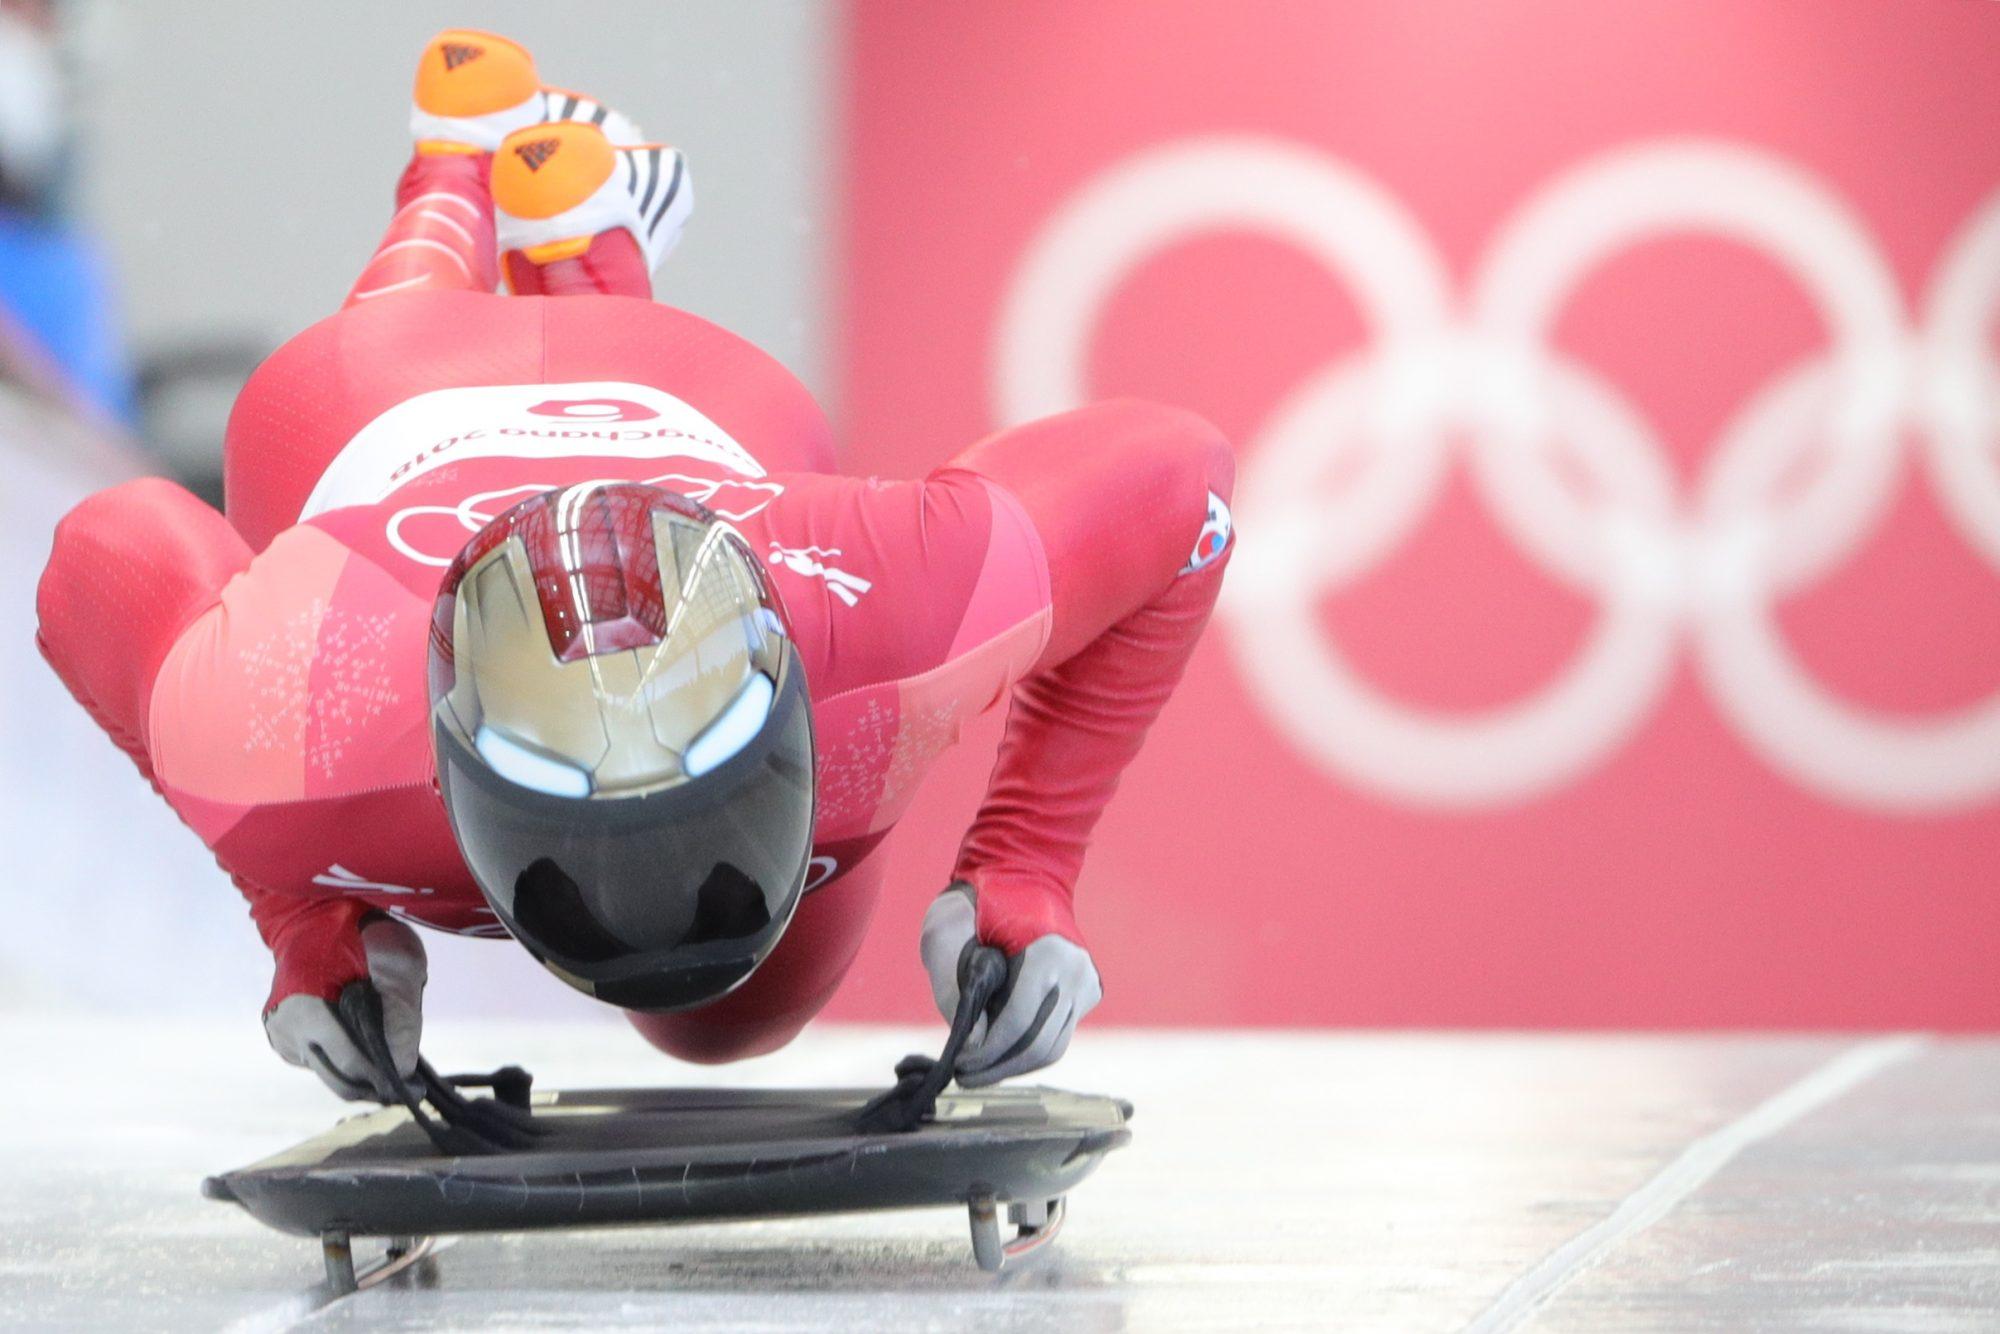 best-skeleton-helmets-winter-olympics-south-korea.jpg